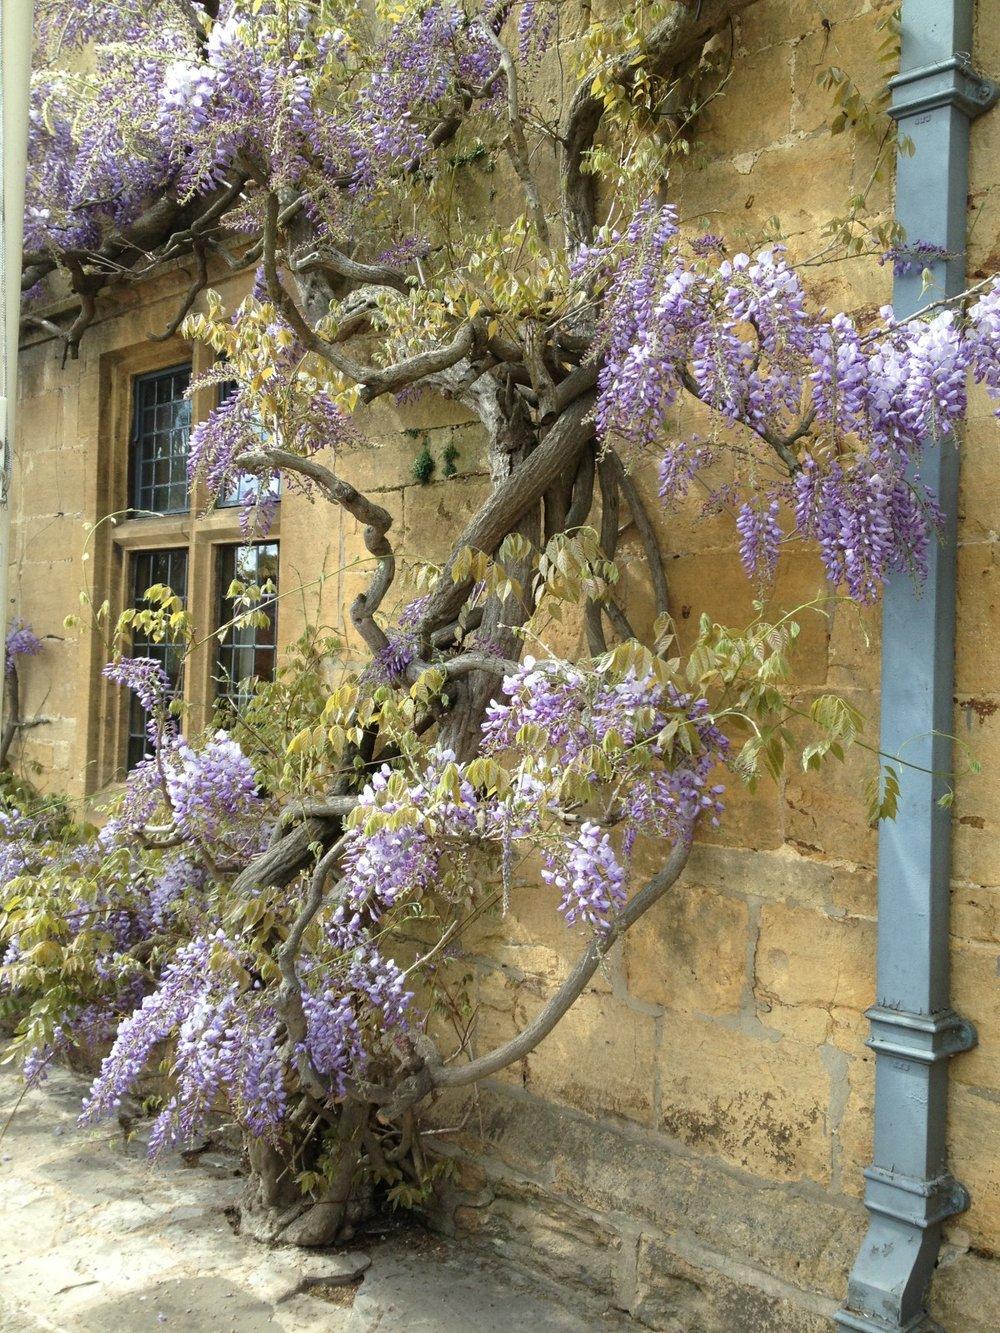 wisteria_broadway_village_life-1181704.jpg